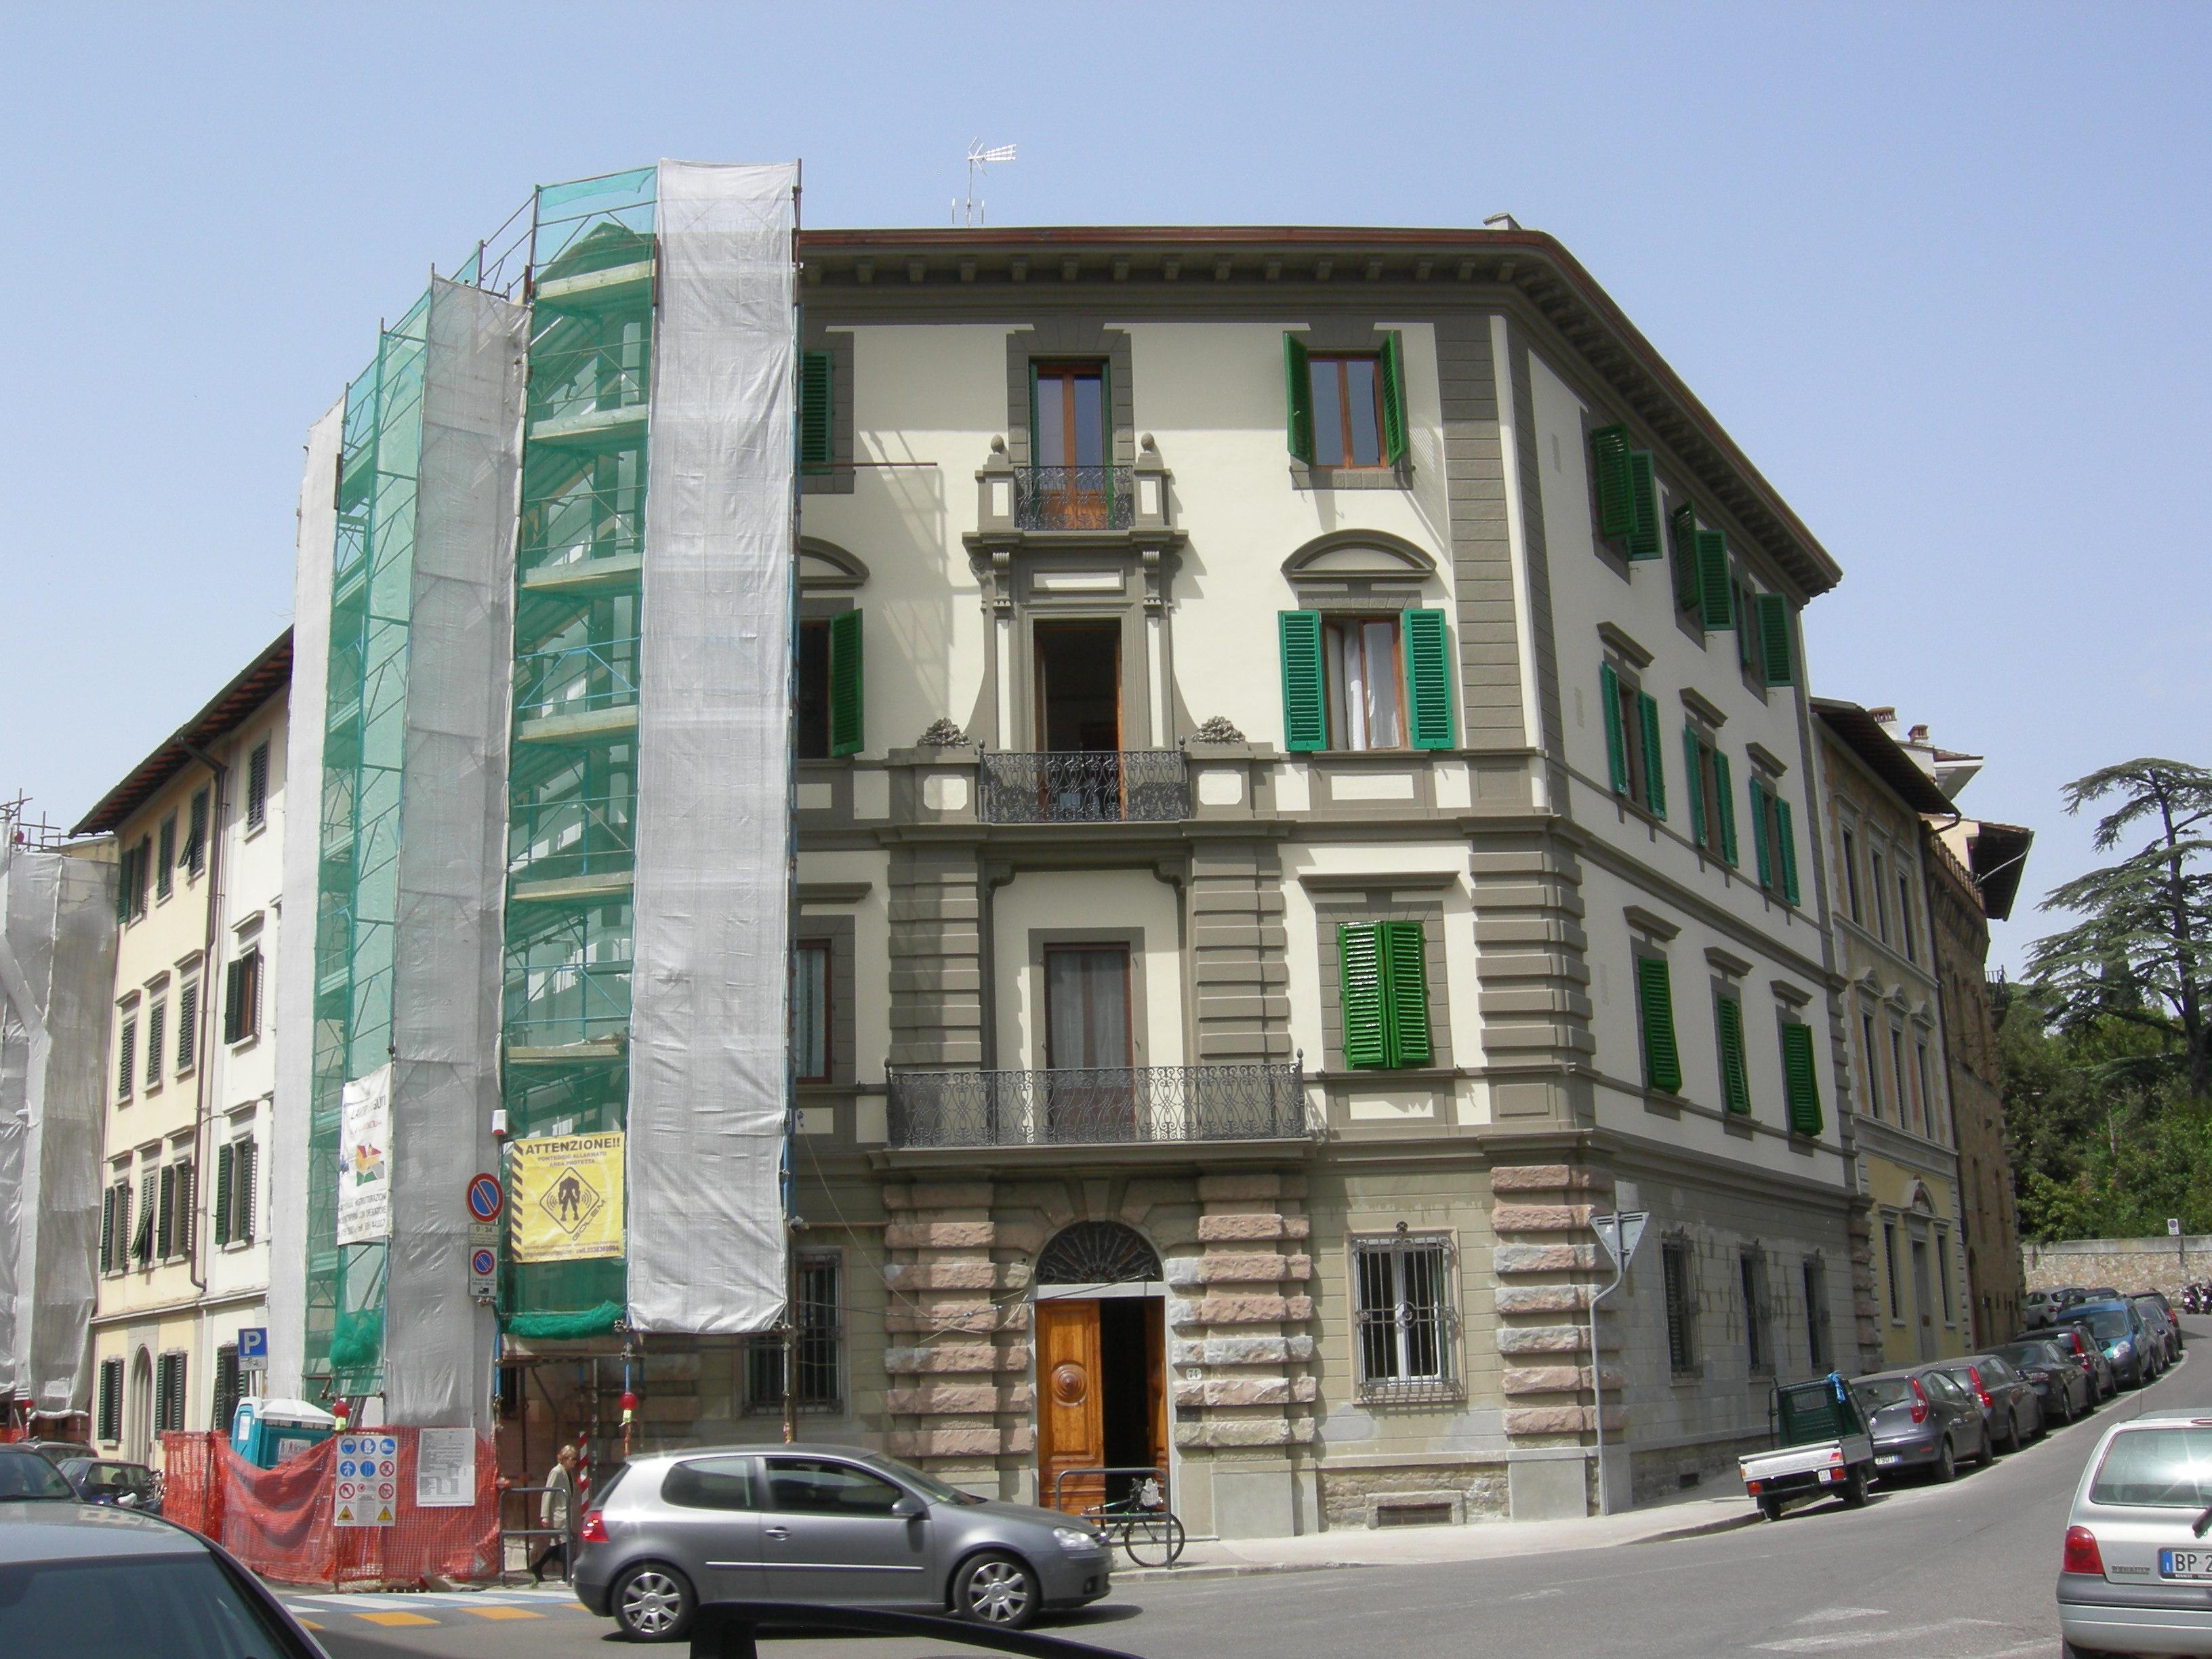 Via Vittorio Emanuele II (FI)